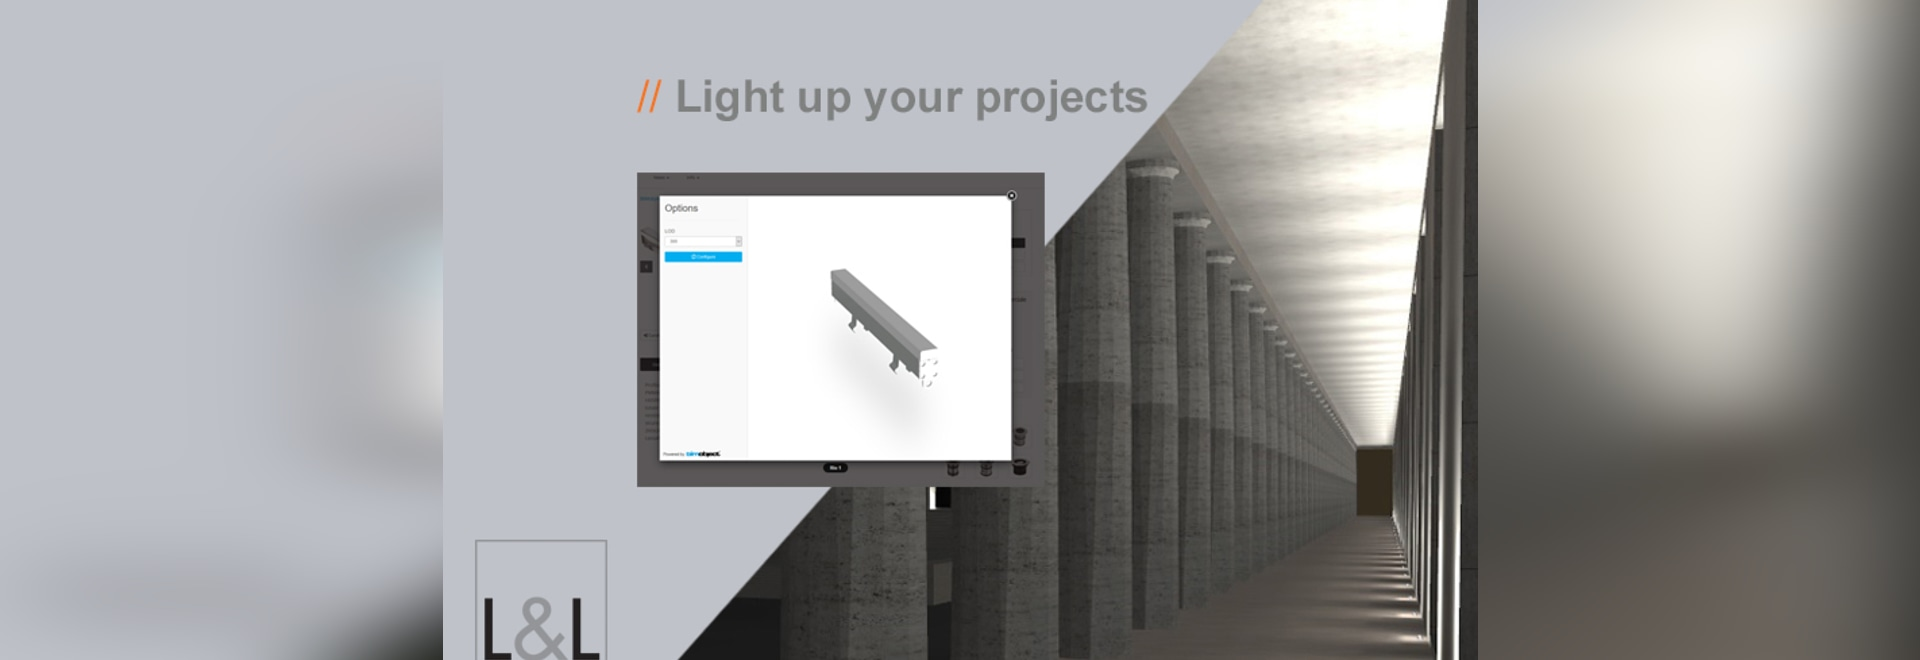 L&L Luce&Light lighting fixtures available in BIM format